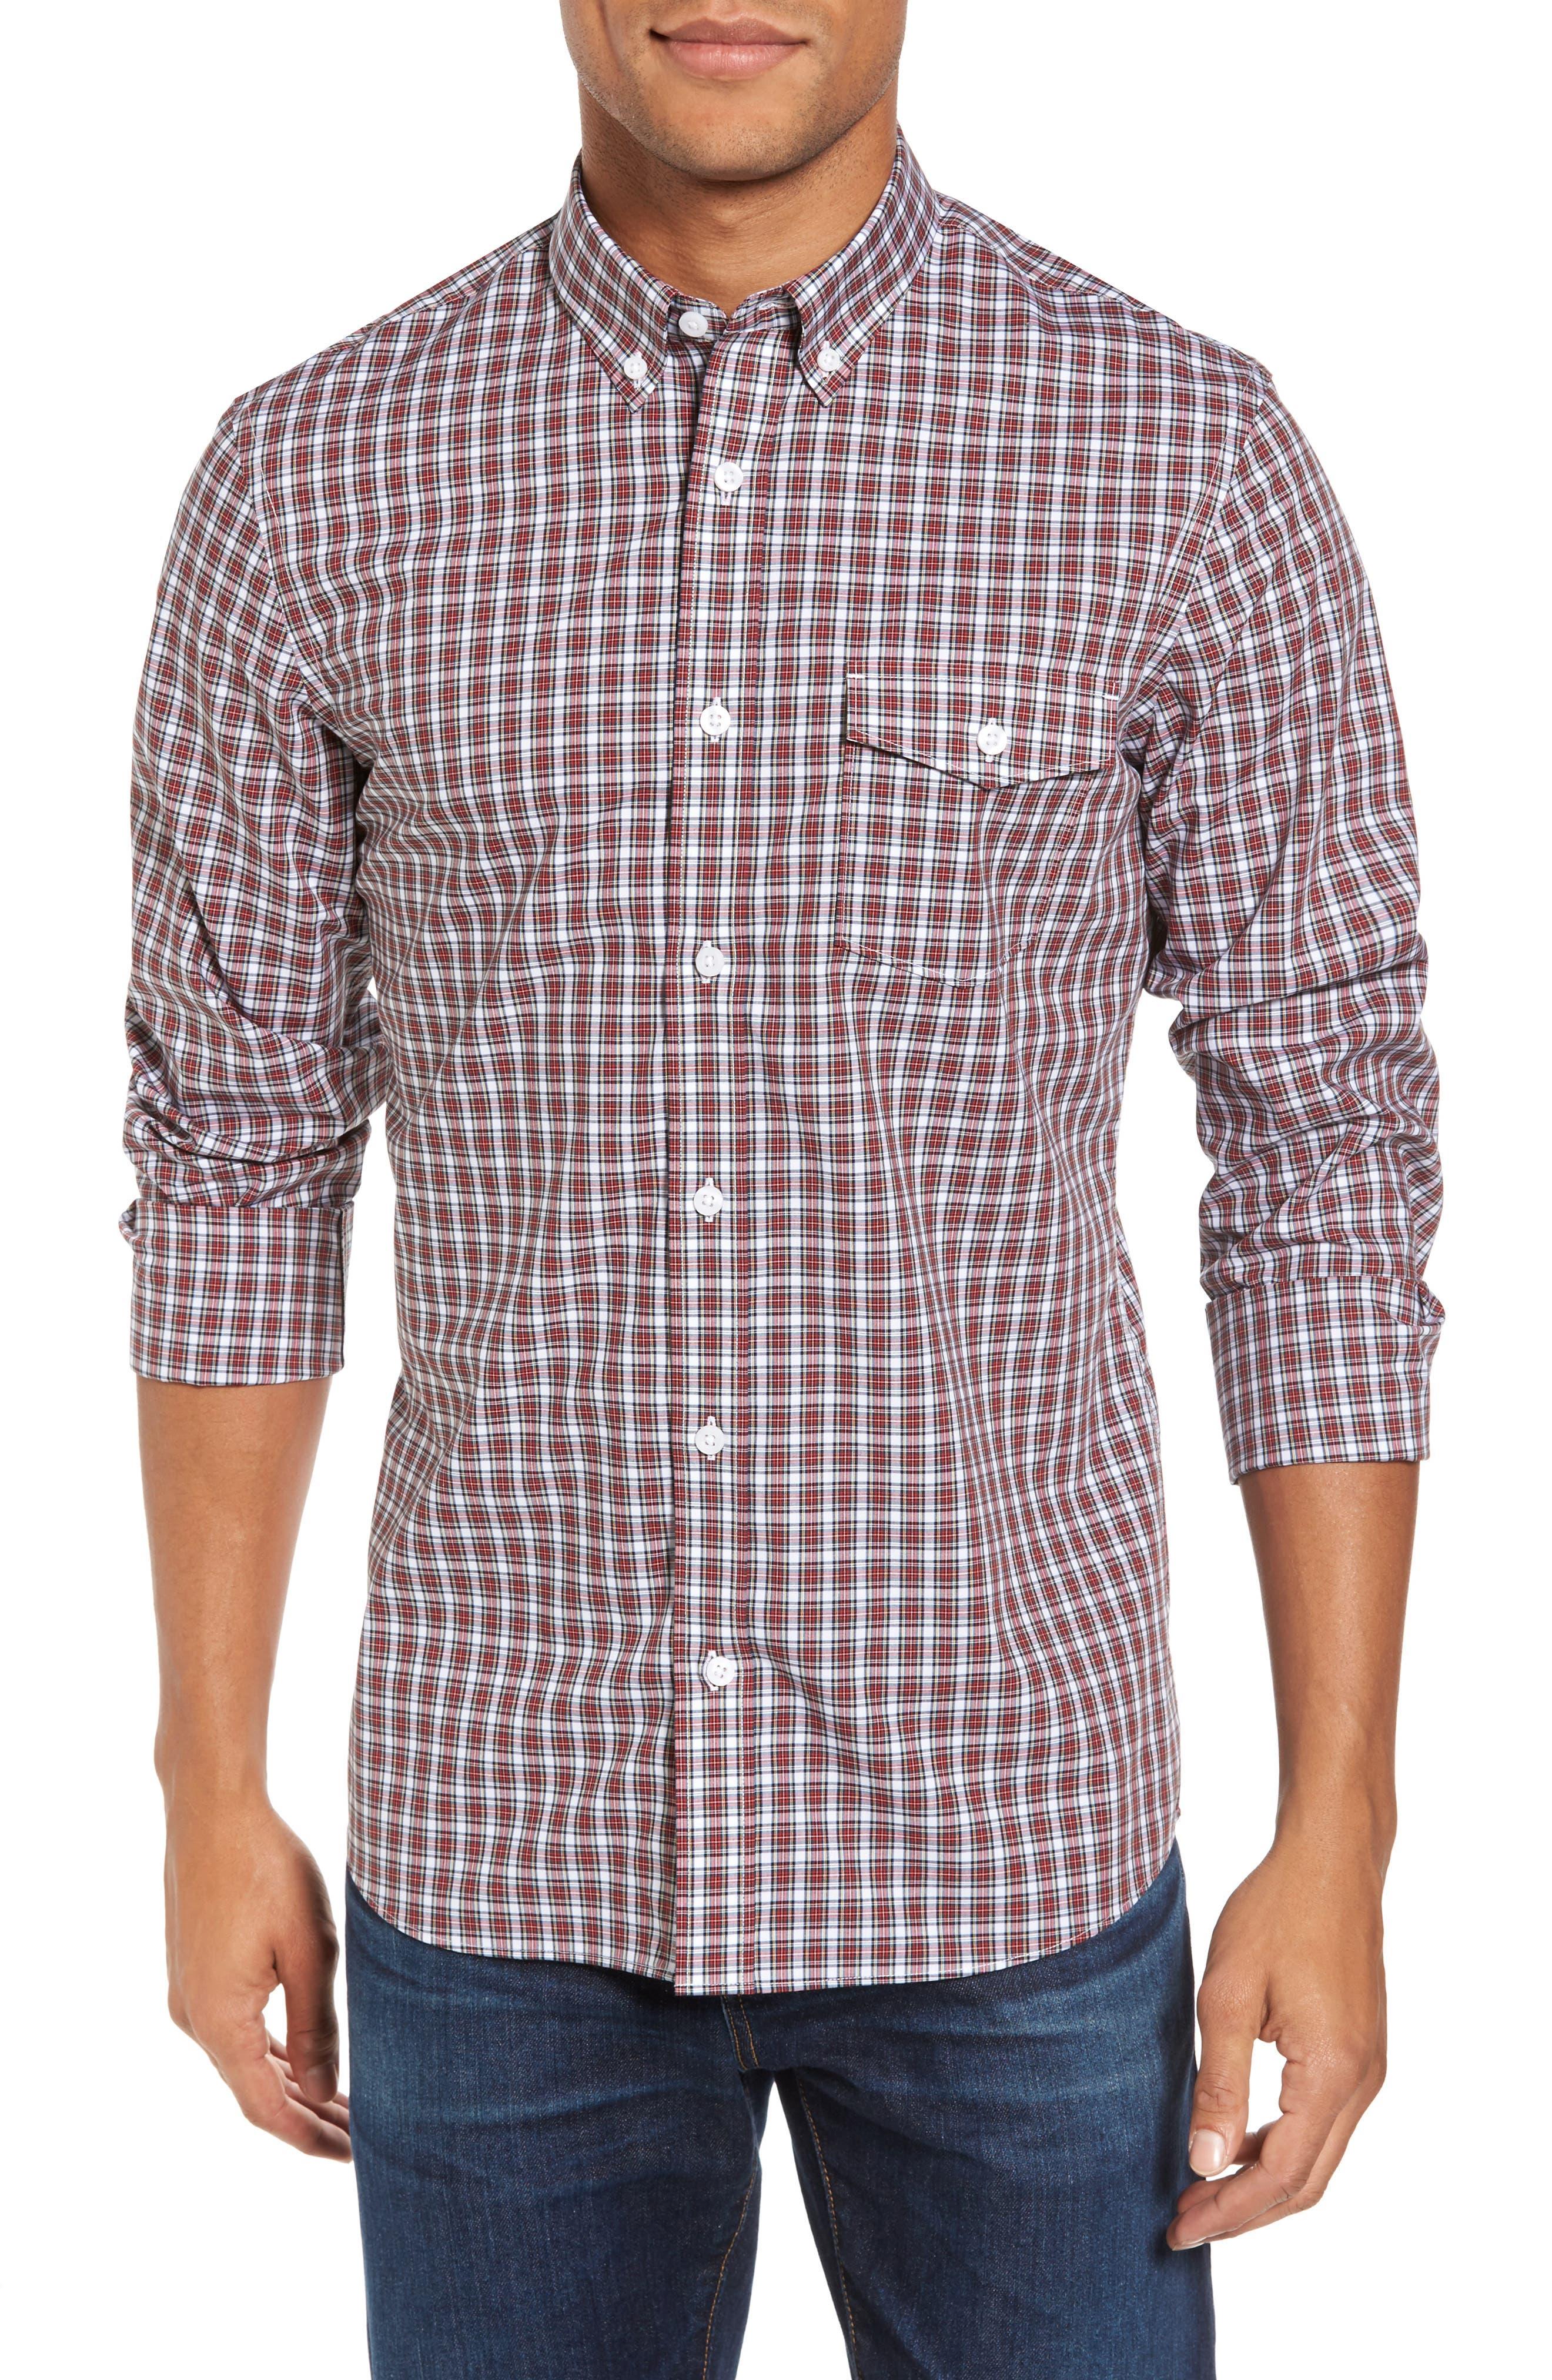 Alternate Image 1 Selected - Nordstrom Men's Shop Ivy Trim Fit Non-Iron Tartan Plaid Sport Shirt